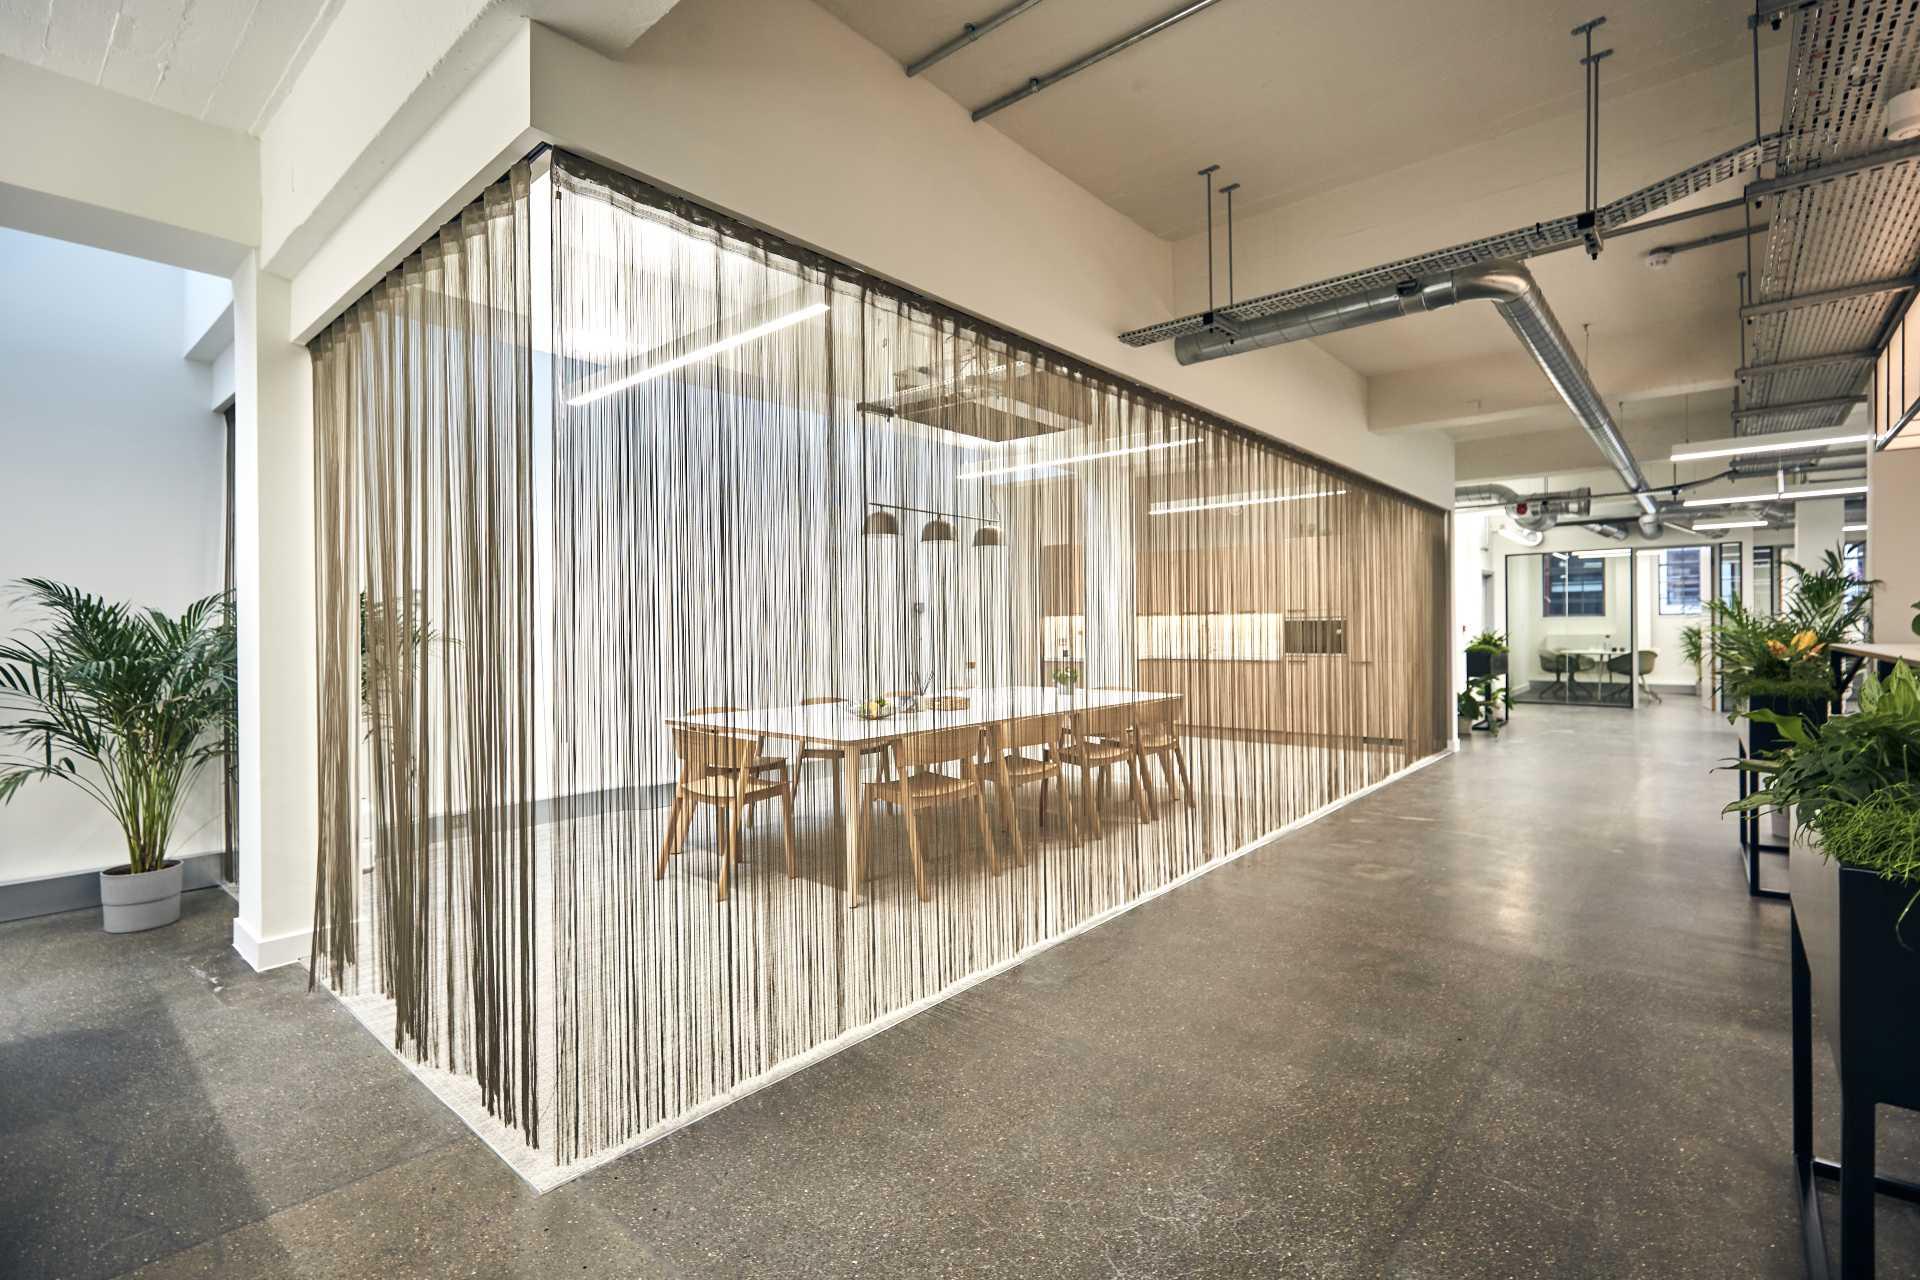 Lighterman House Project by Peldon Rose